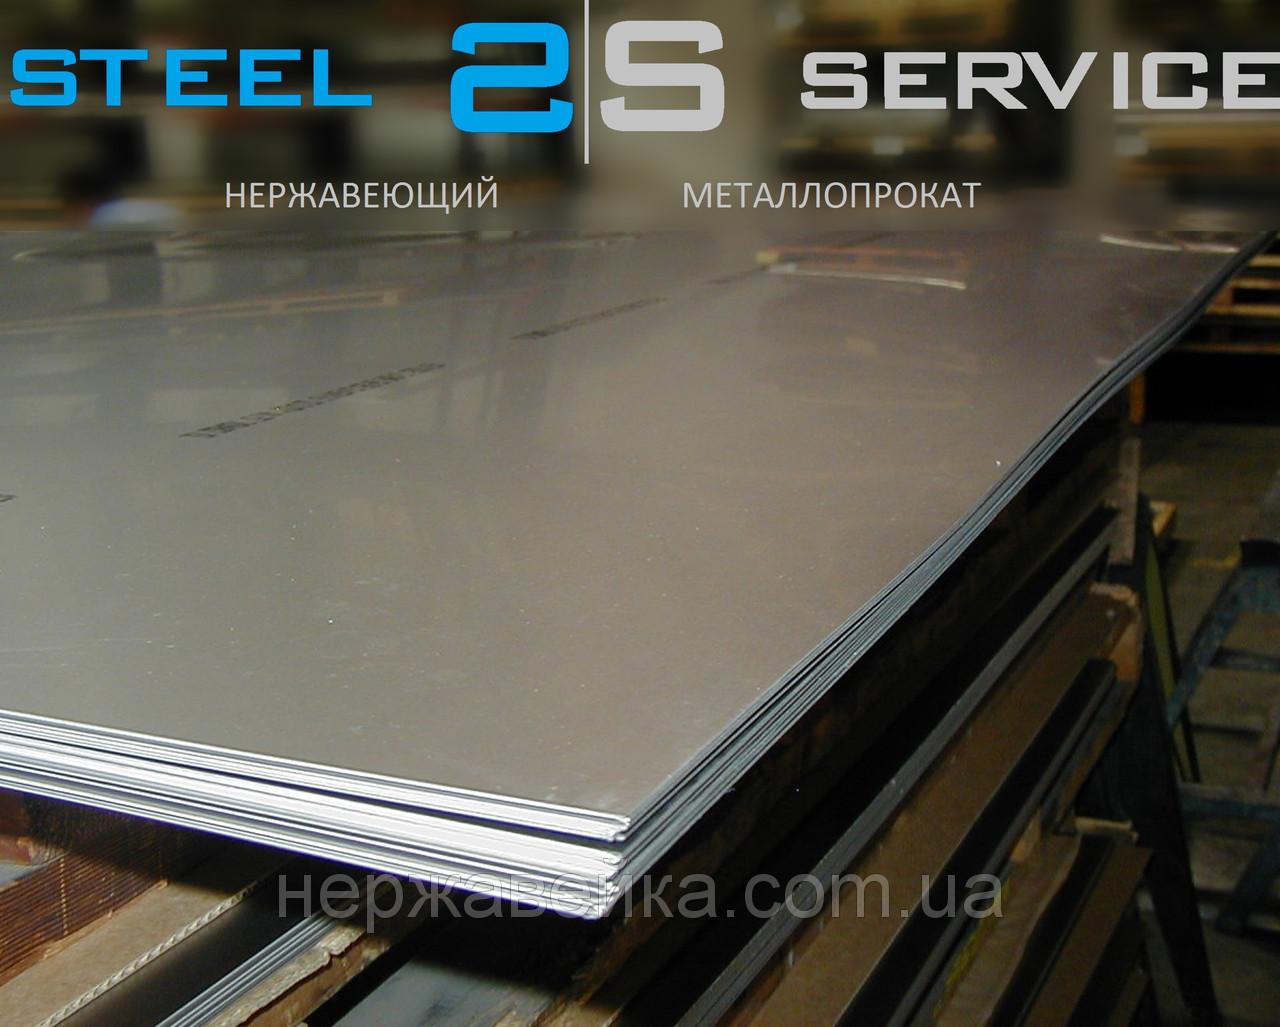 Нержавейка лист 1,5х1250х2500мм  AISI 316L(03Х17Н14М3) 2B - матовый,  кислотостойкий